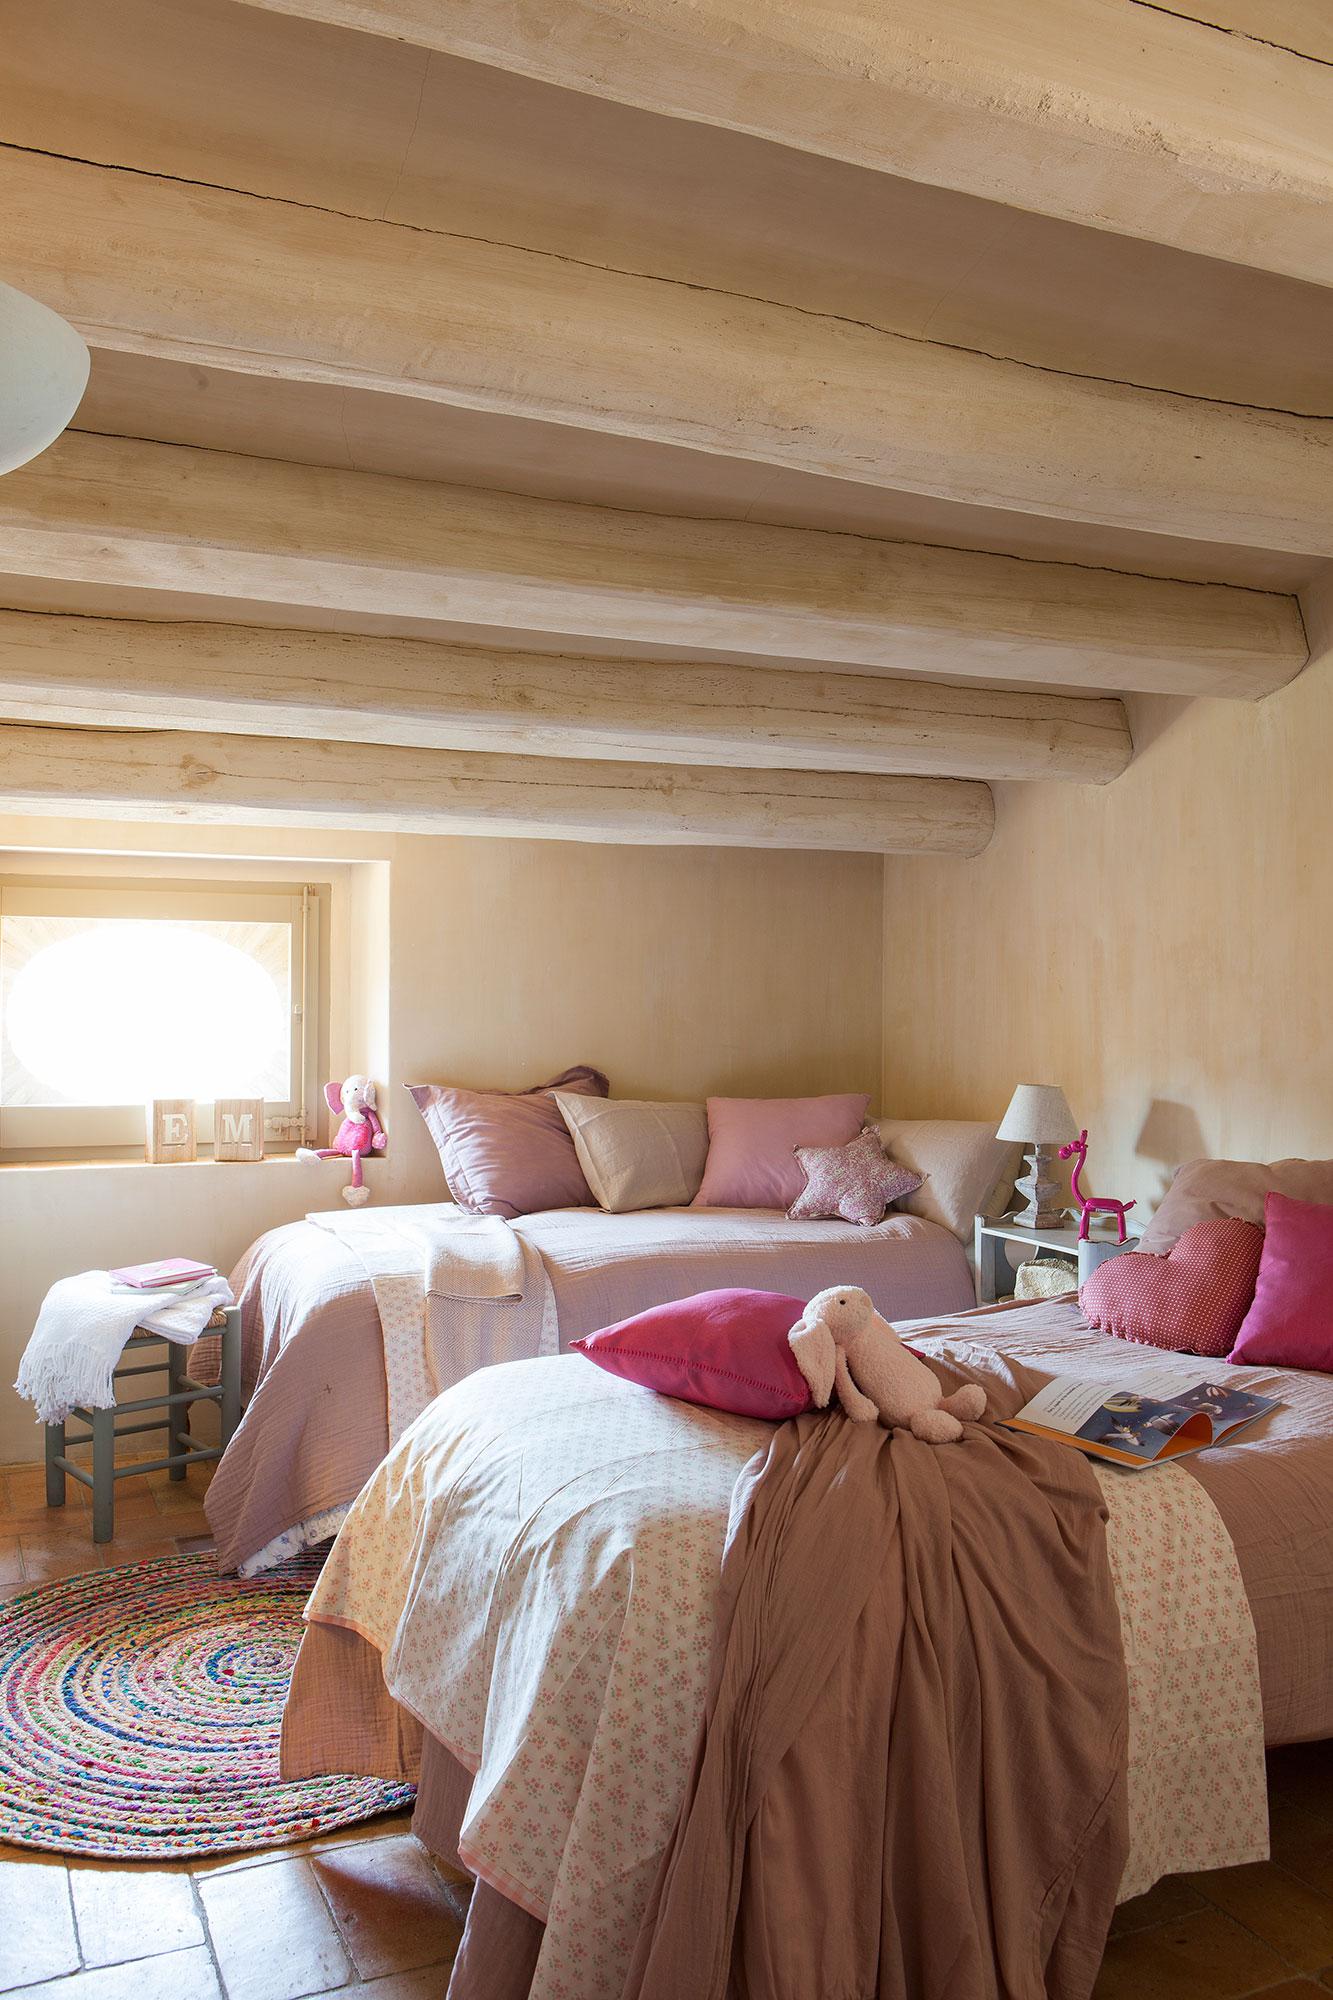 Dormitorios infantiles 7 buenas ideas para compartir - Dormitorio dos camas ...